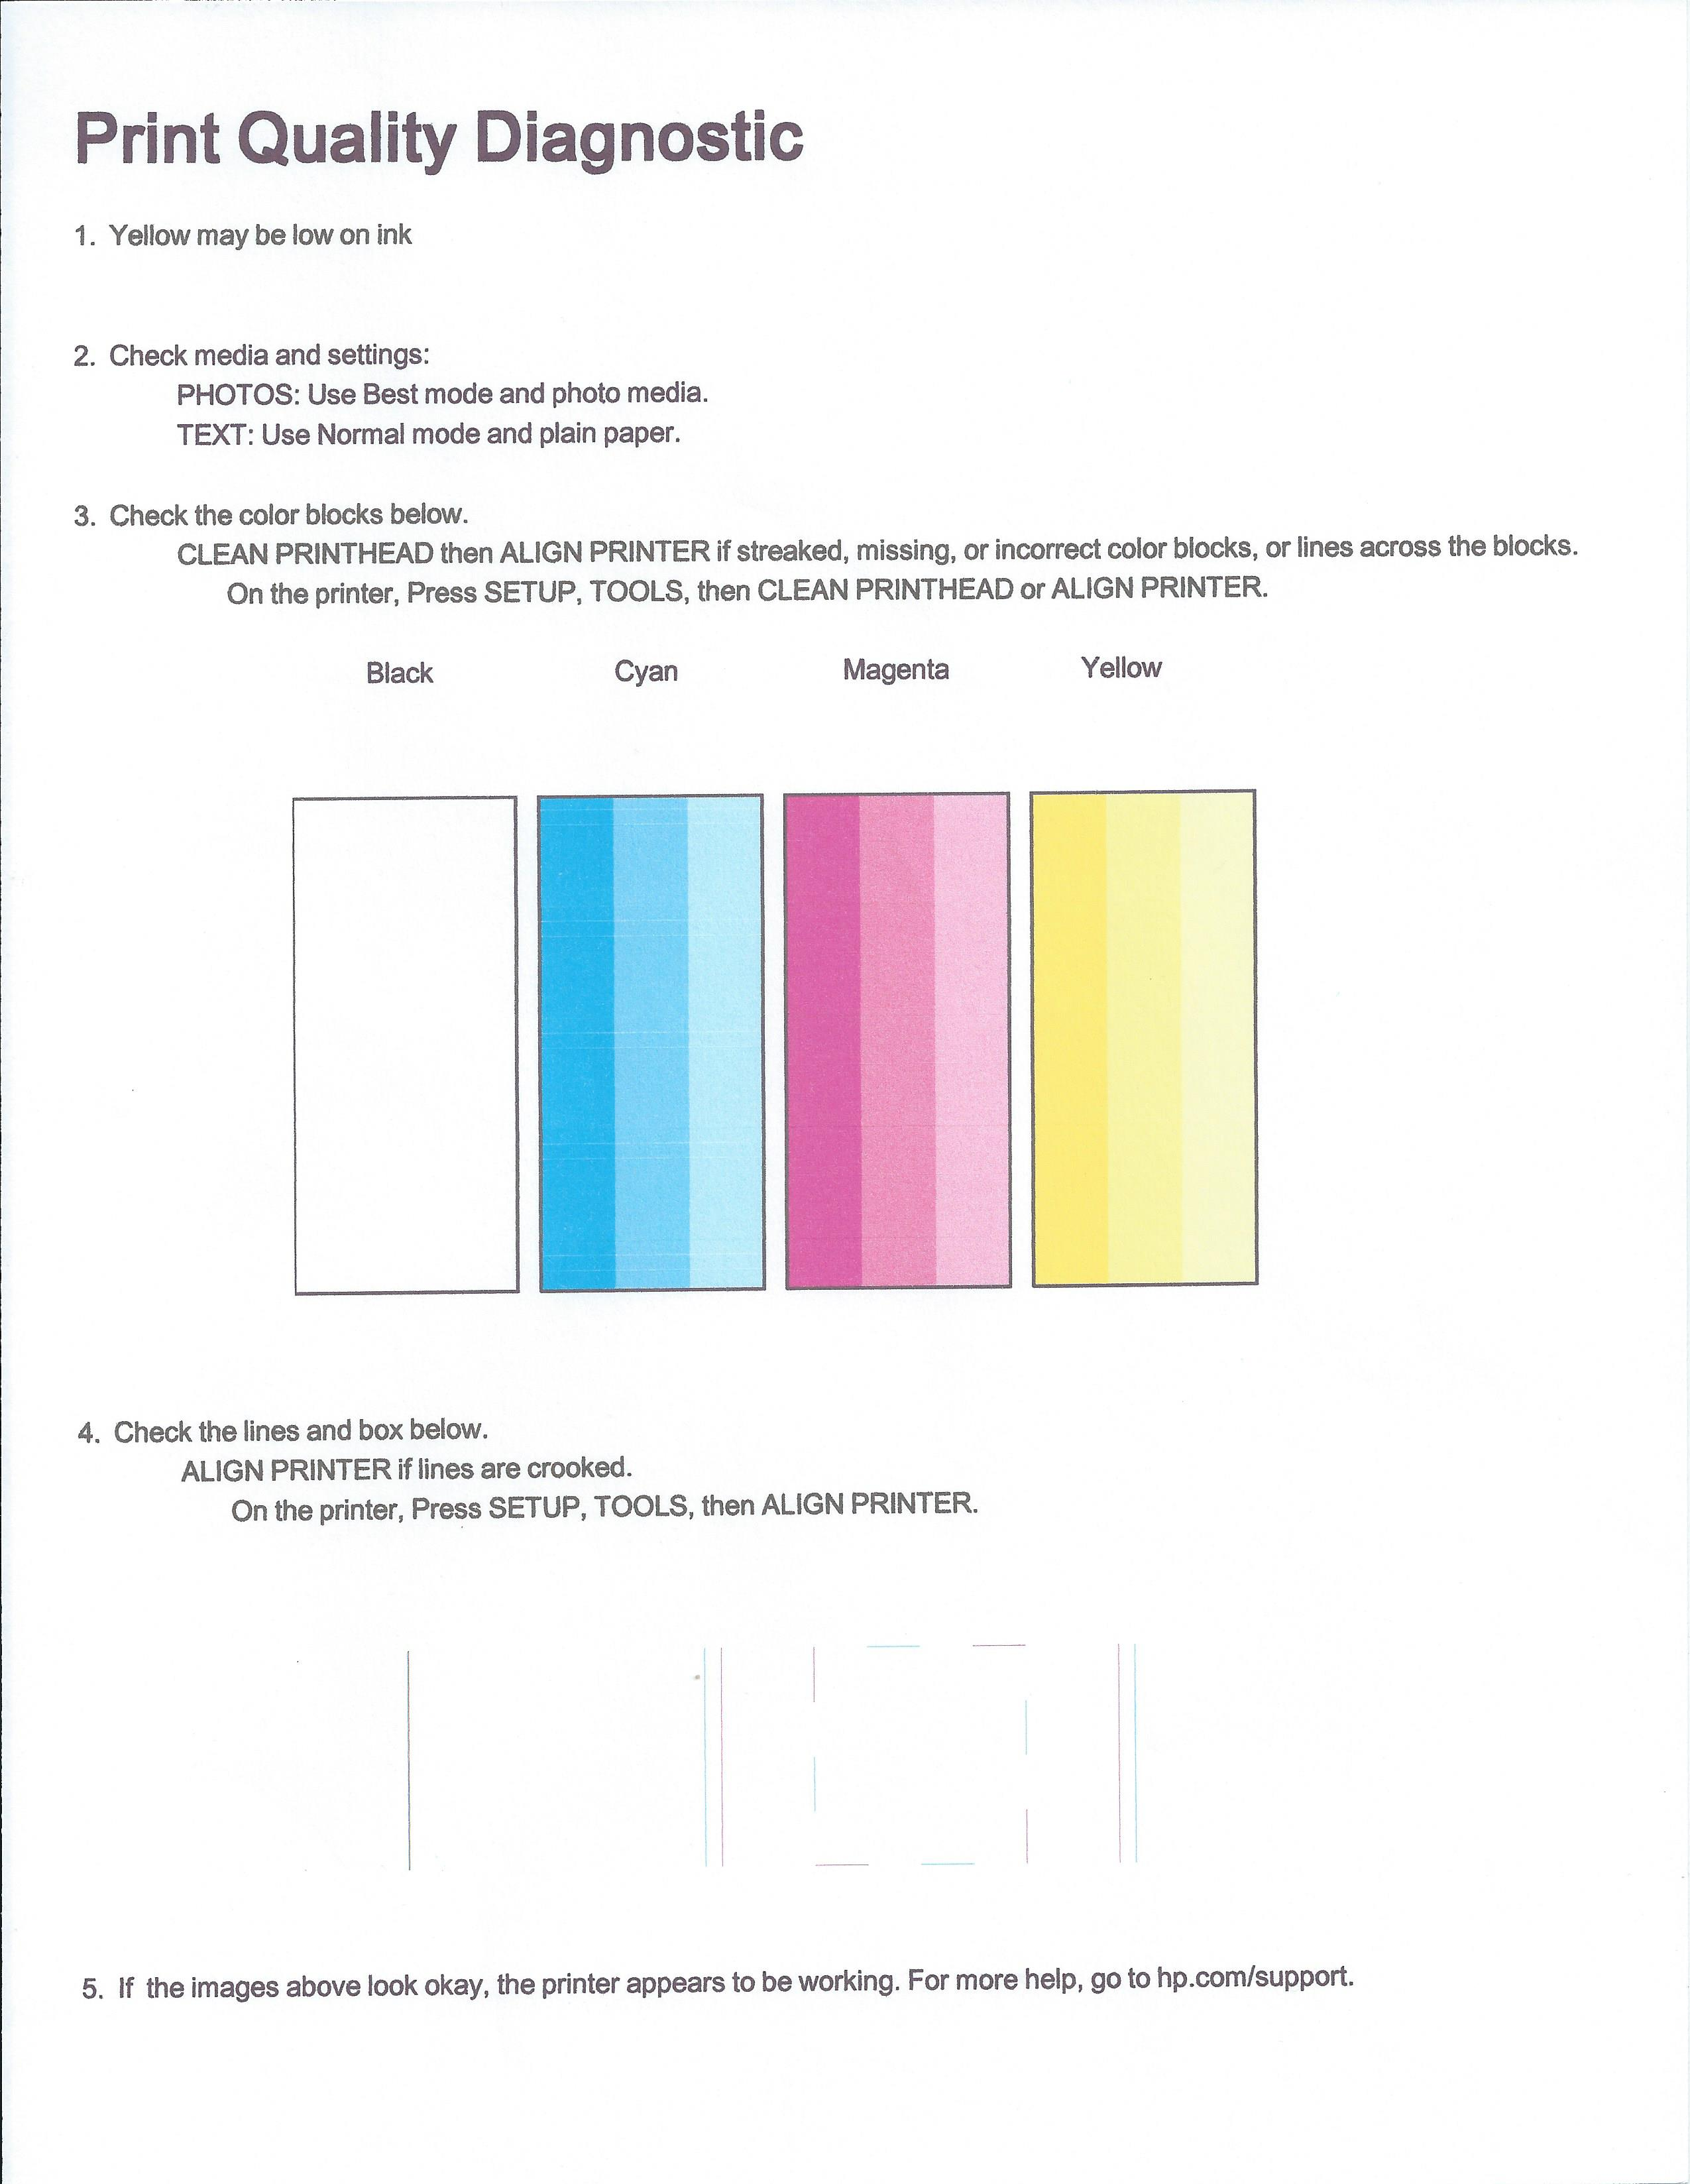 PhotoSmart 6520 Printer Not Printing Black Correctly